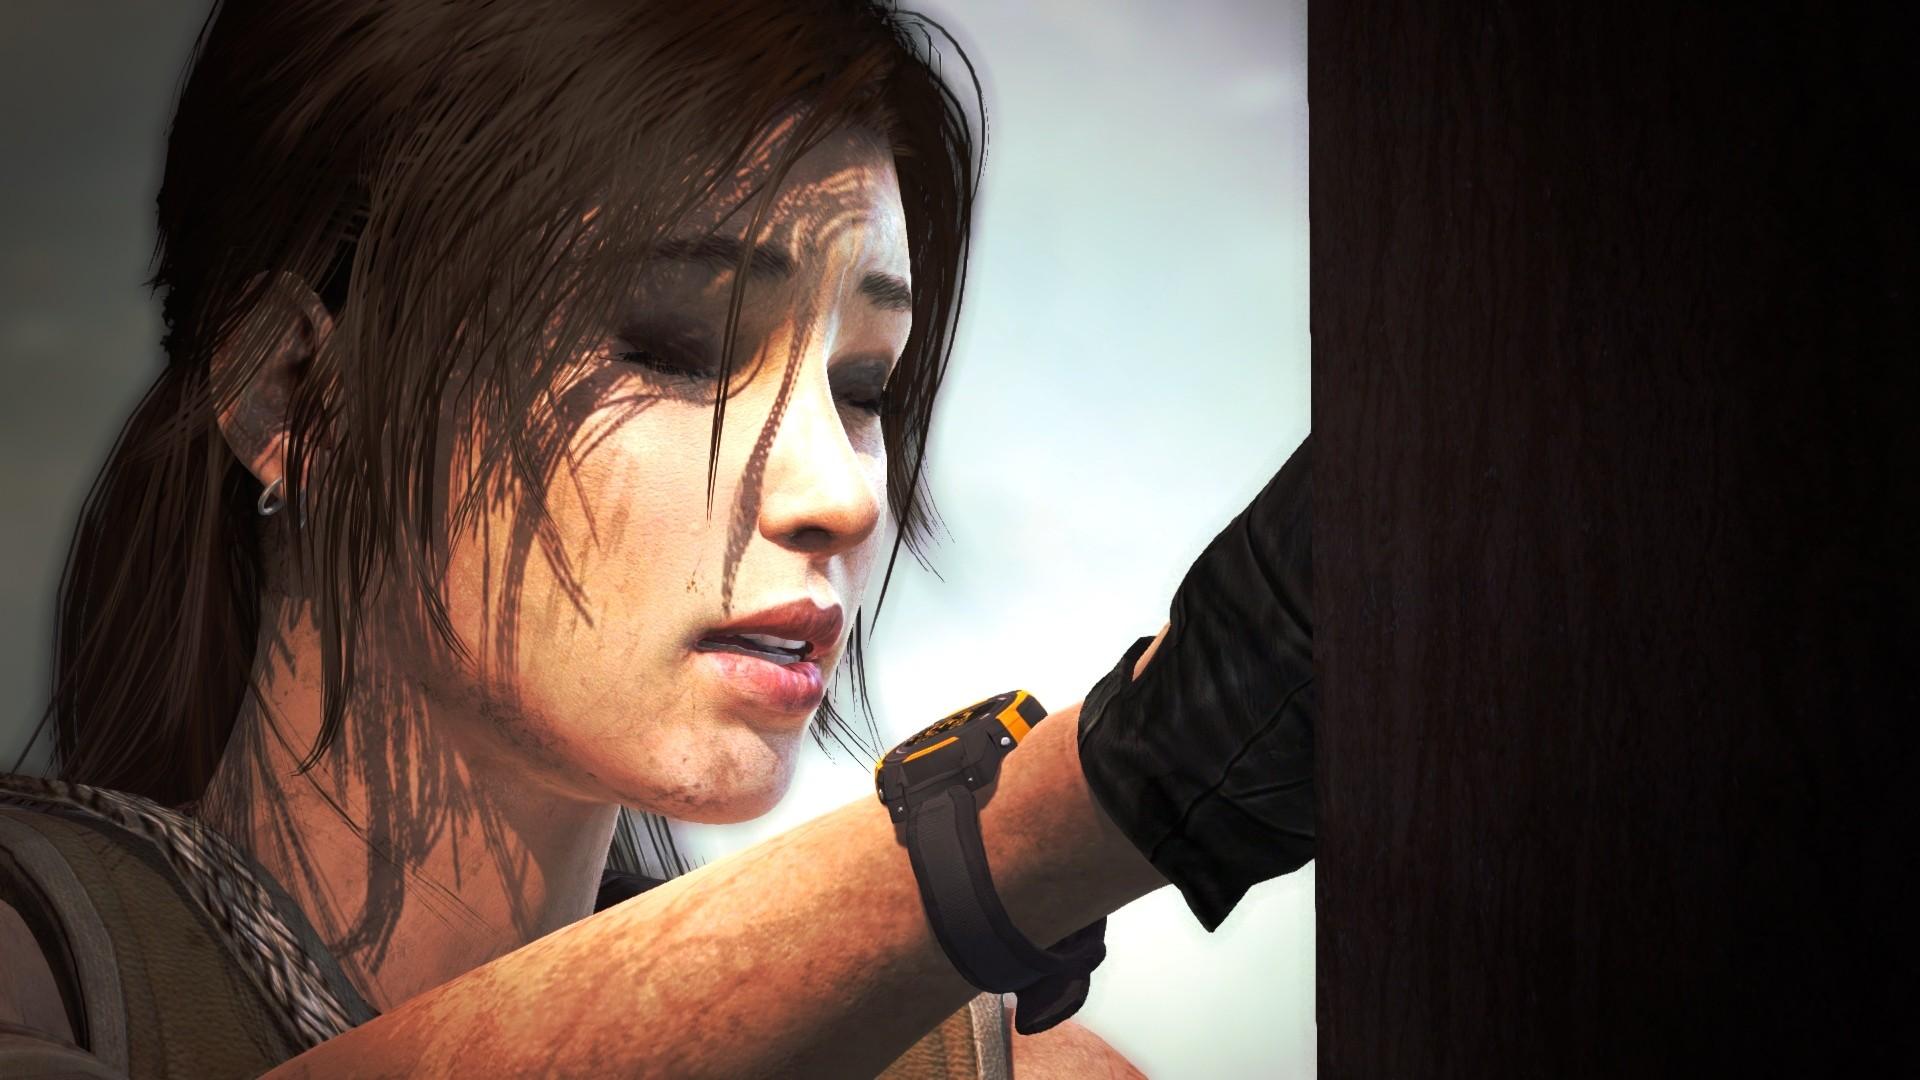 Tomb Raider Lara Croft Brunette Face Wallpaper 1920x1080 79027